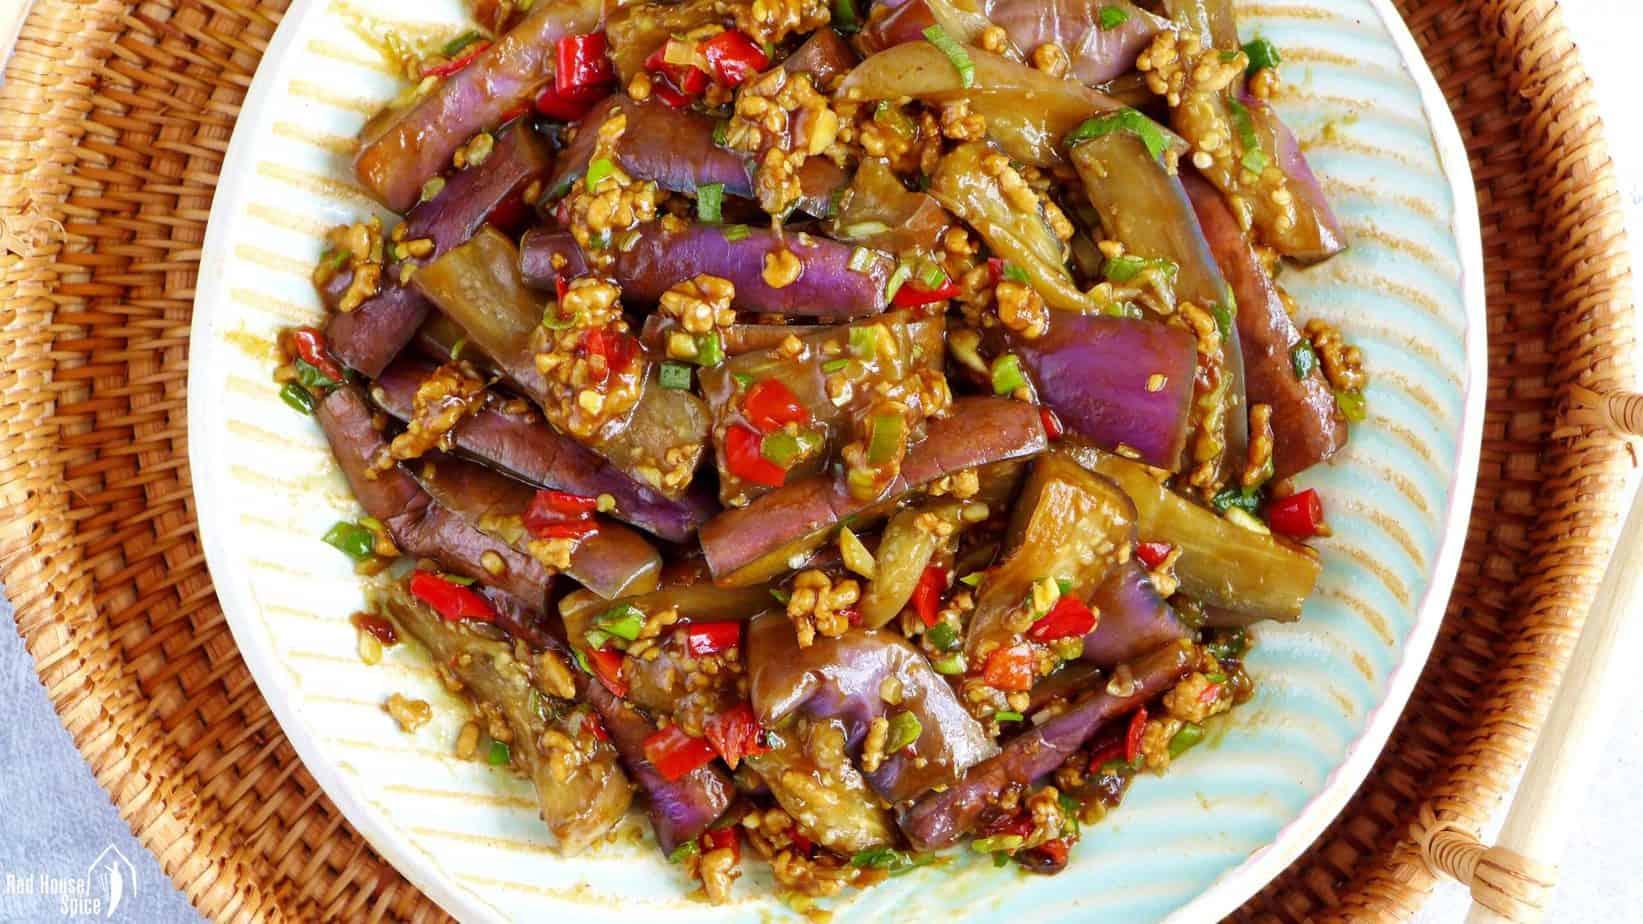 Chinese stir-fried eggplant with garlic sauce